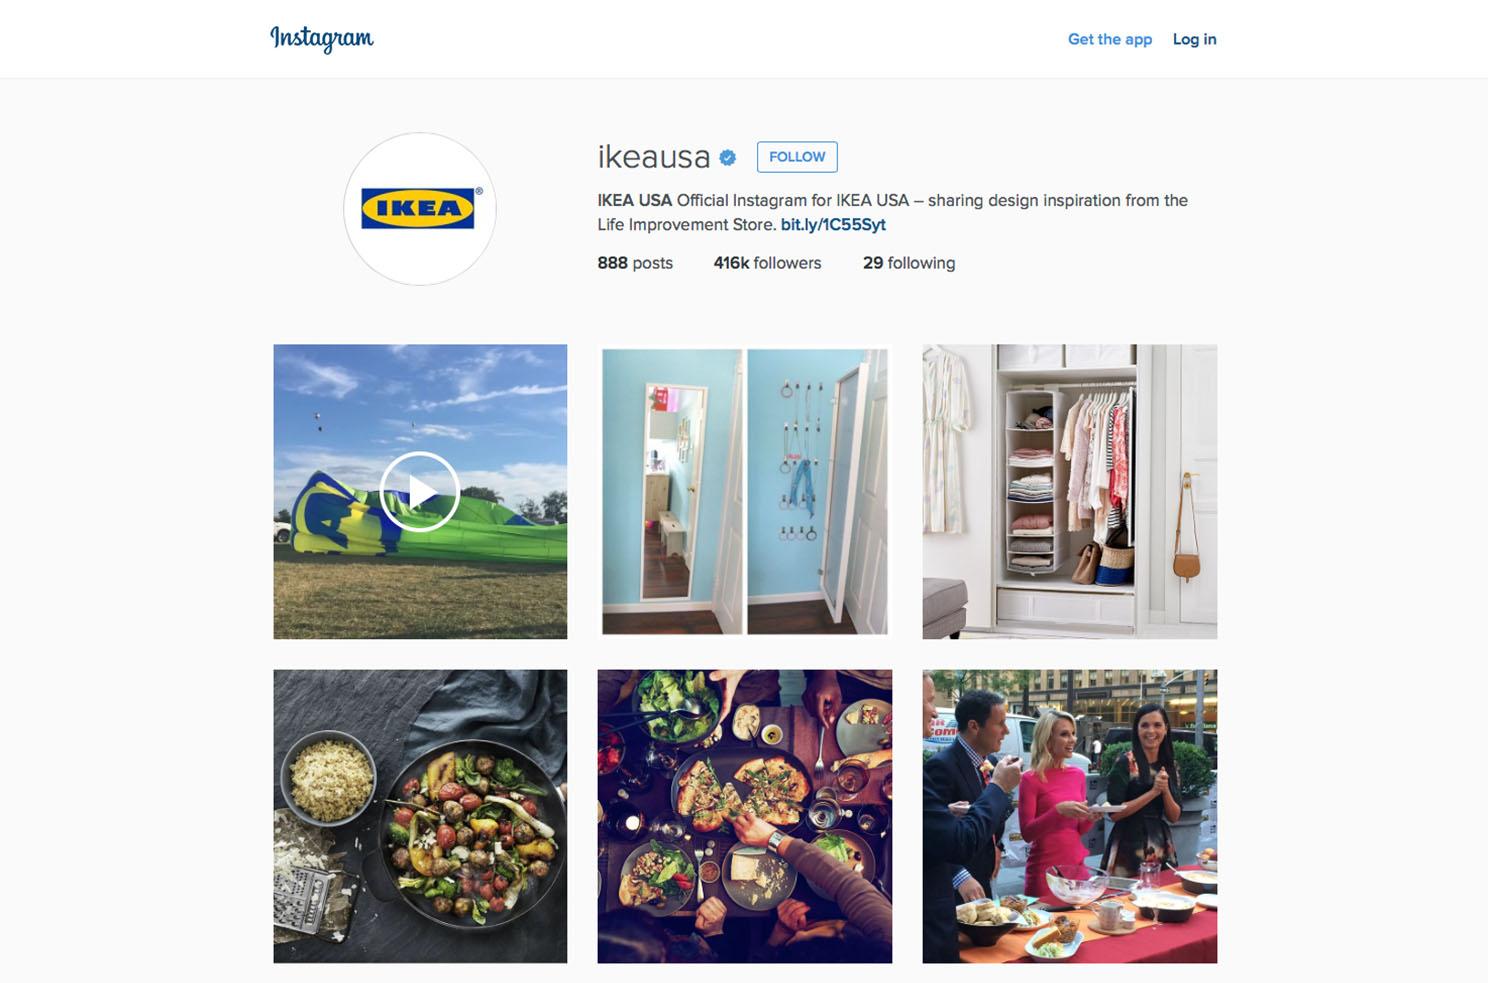 Ikea USA instagram Marvellous digital marketing agency